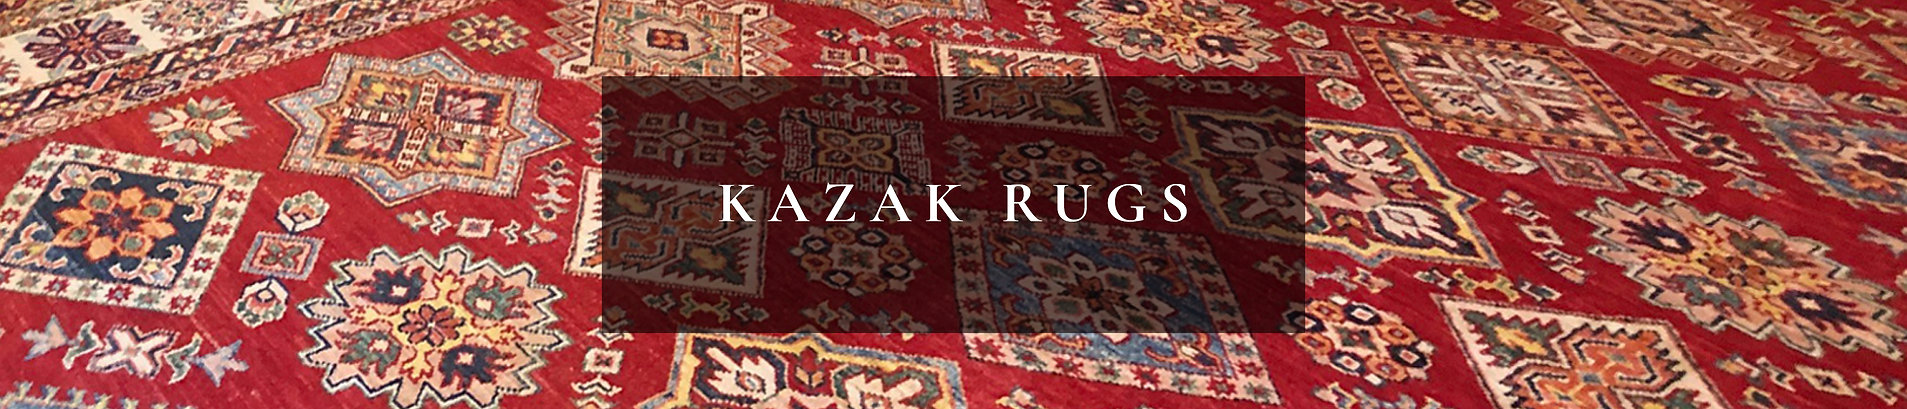 Kazak Rugs.jpg